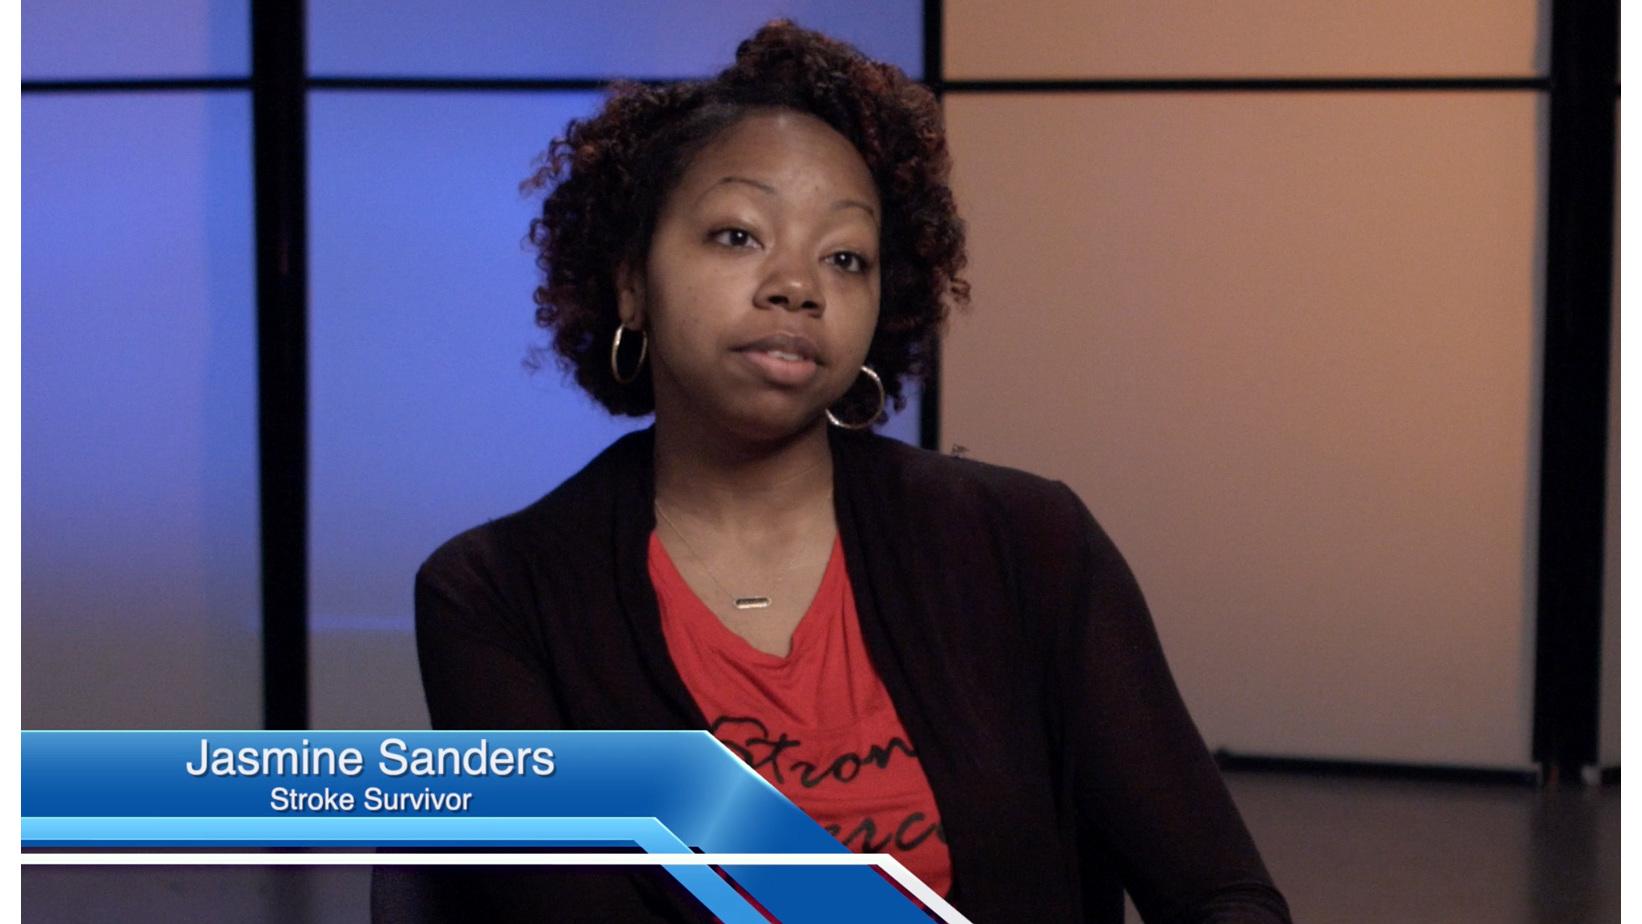 Jasmine Sanders is a stroke survivor